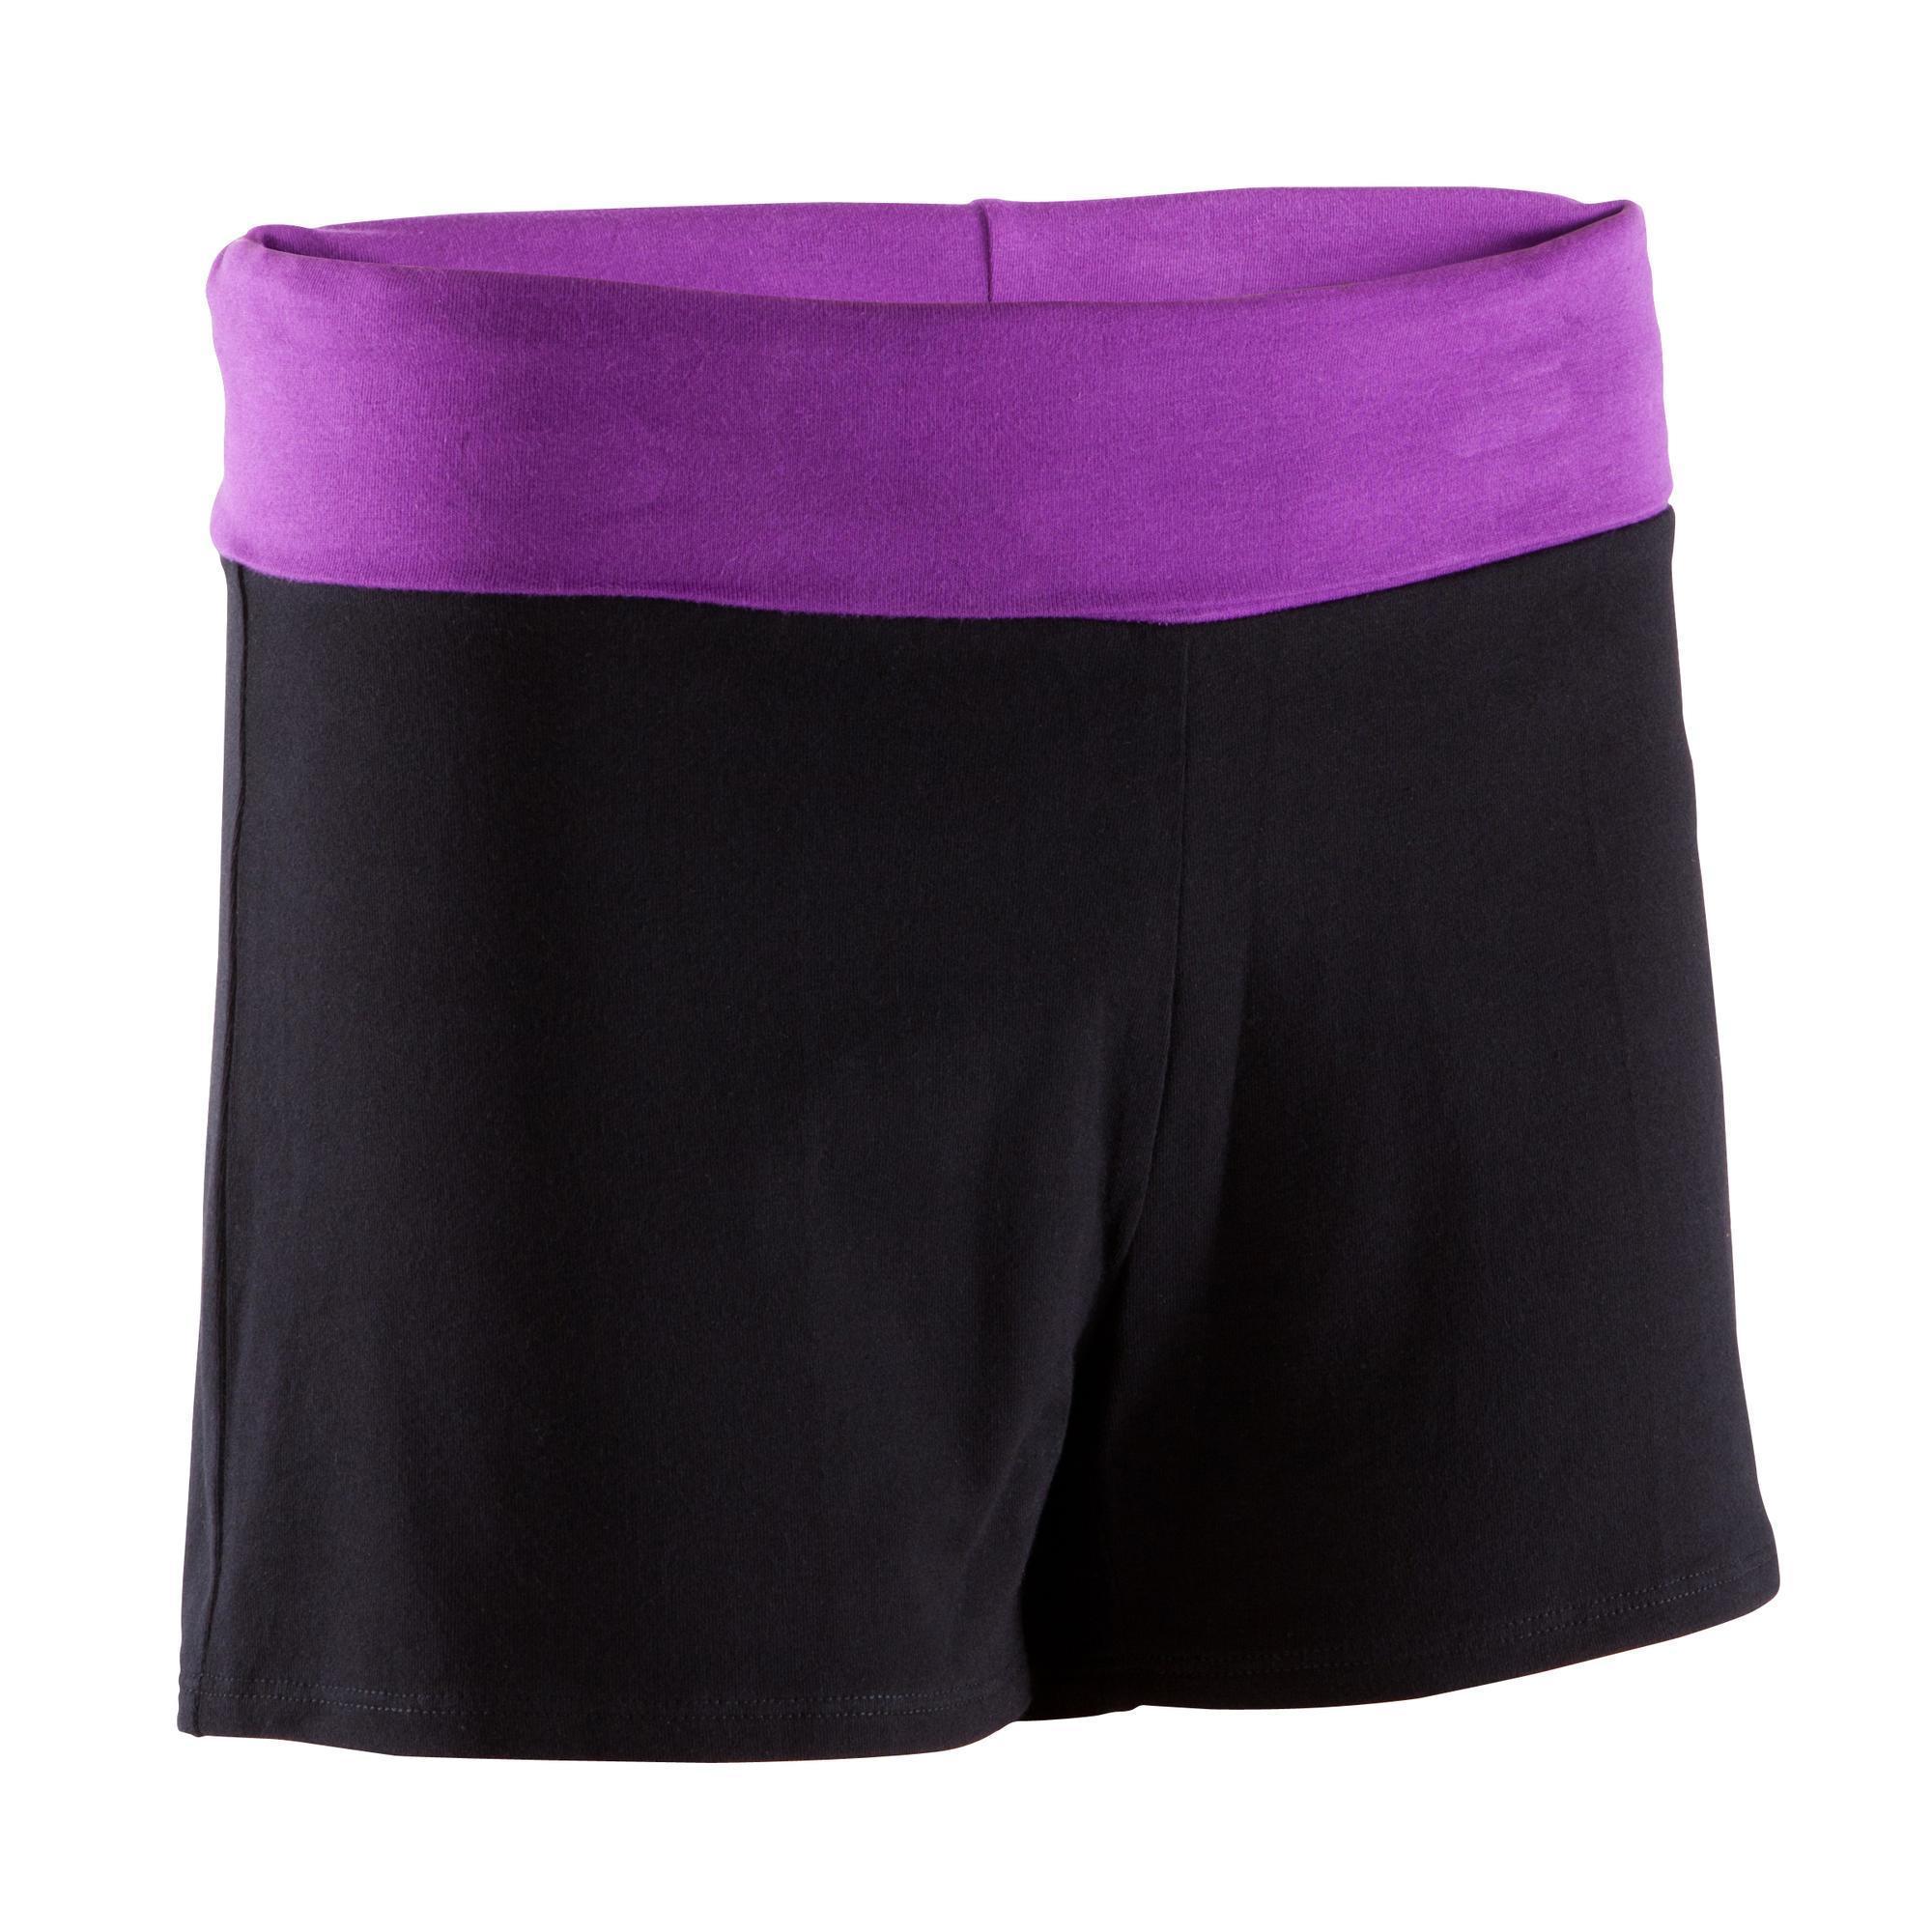 Short yoga coton bio femme noir violet domyos by decathlon - Petit trampoline decathlon ...